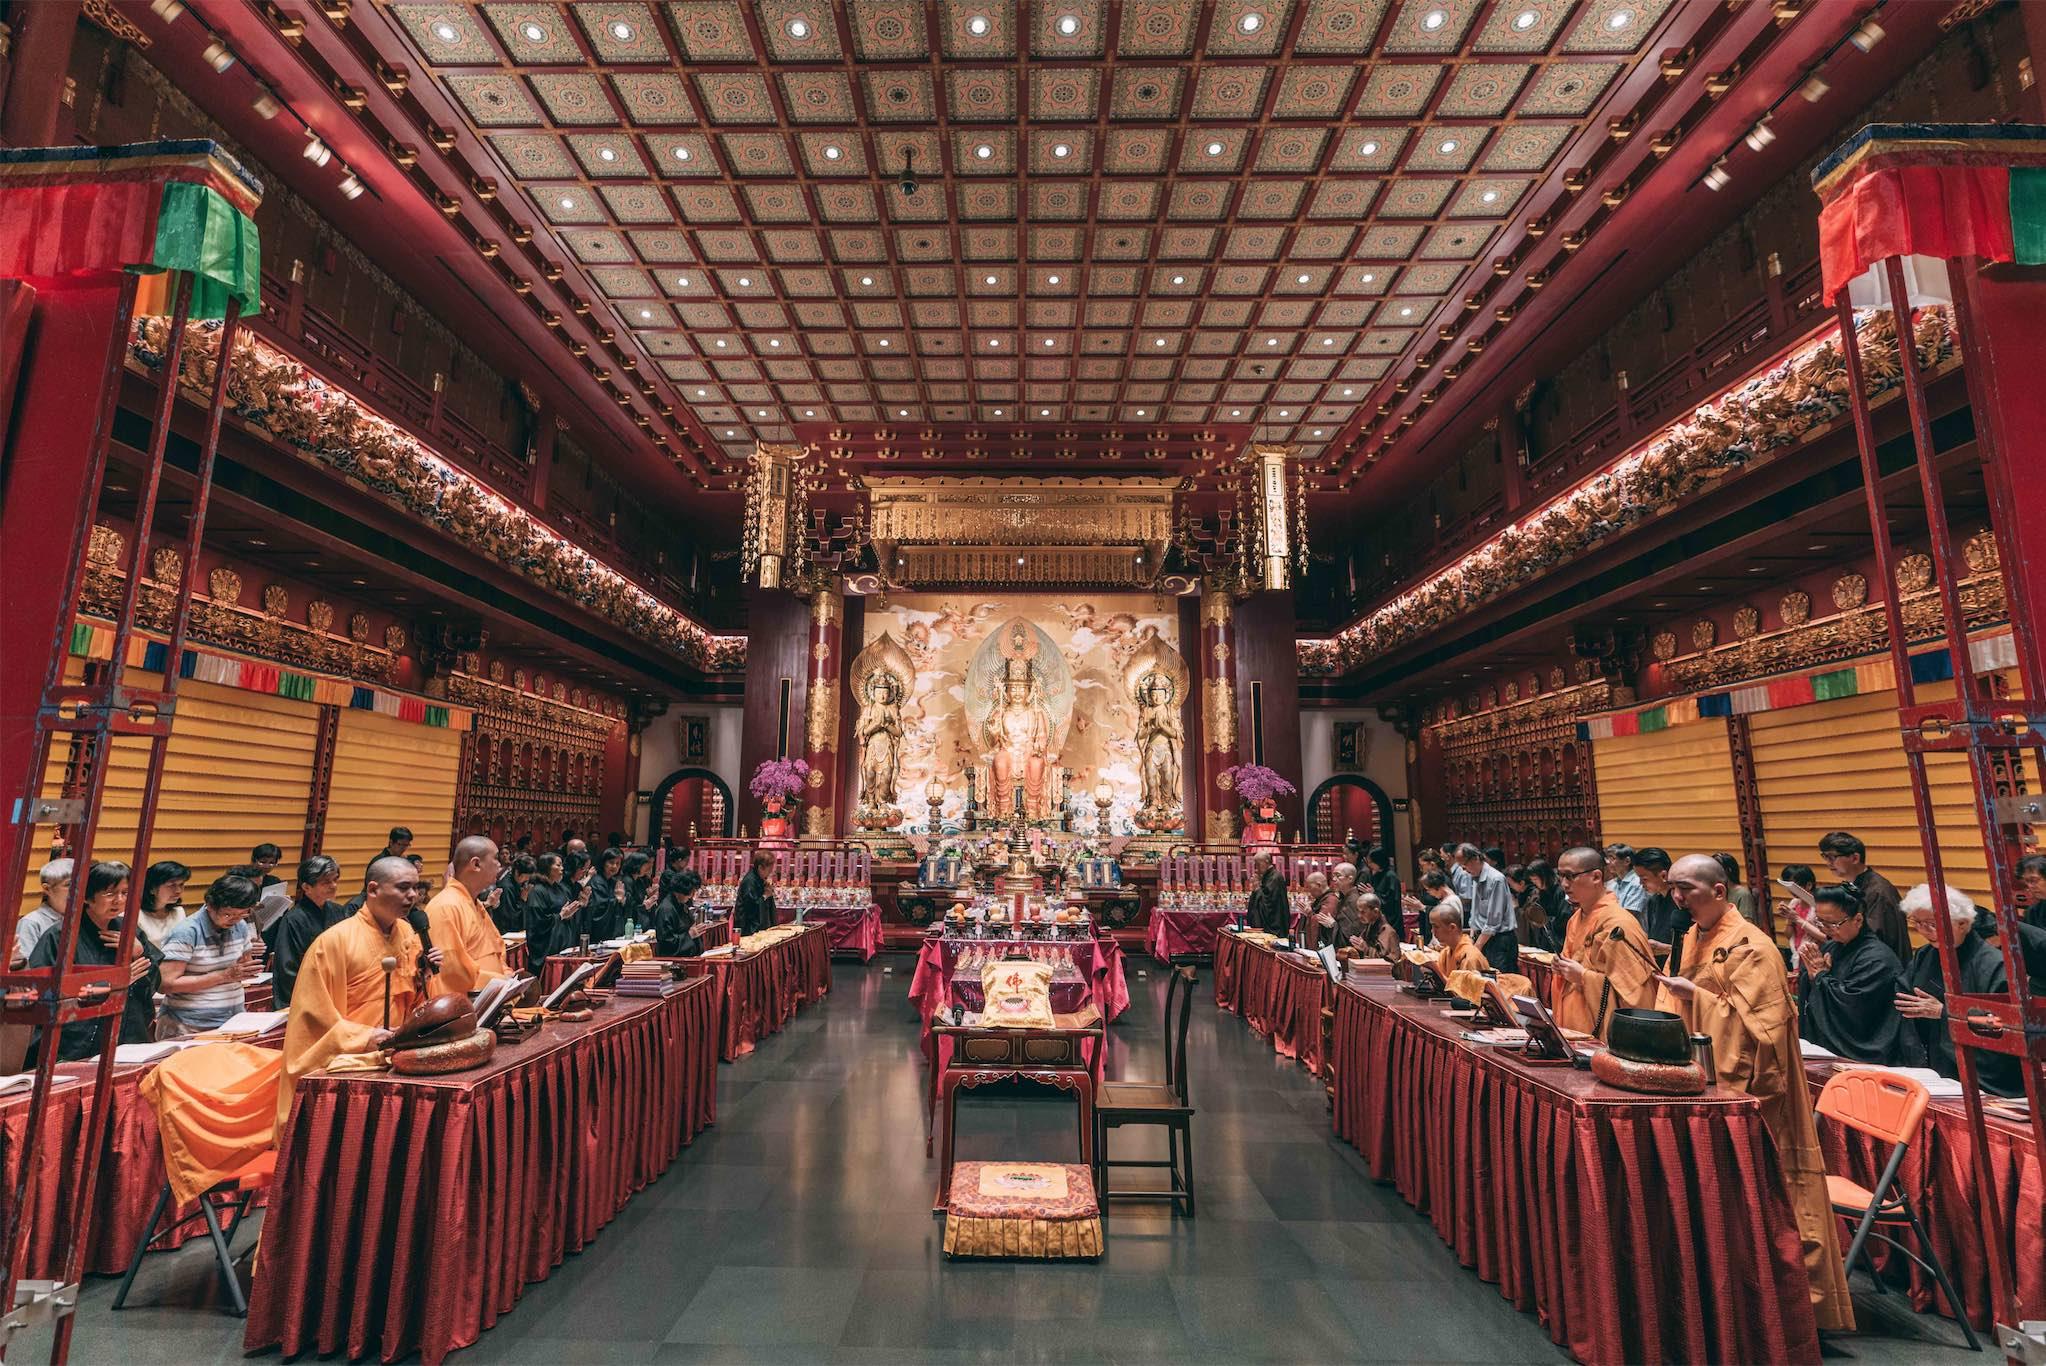 Buddha Relic Temple, Chinatown